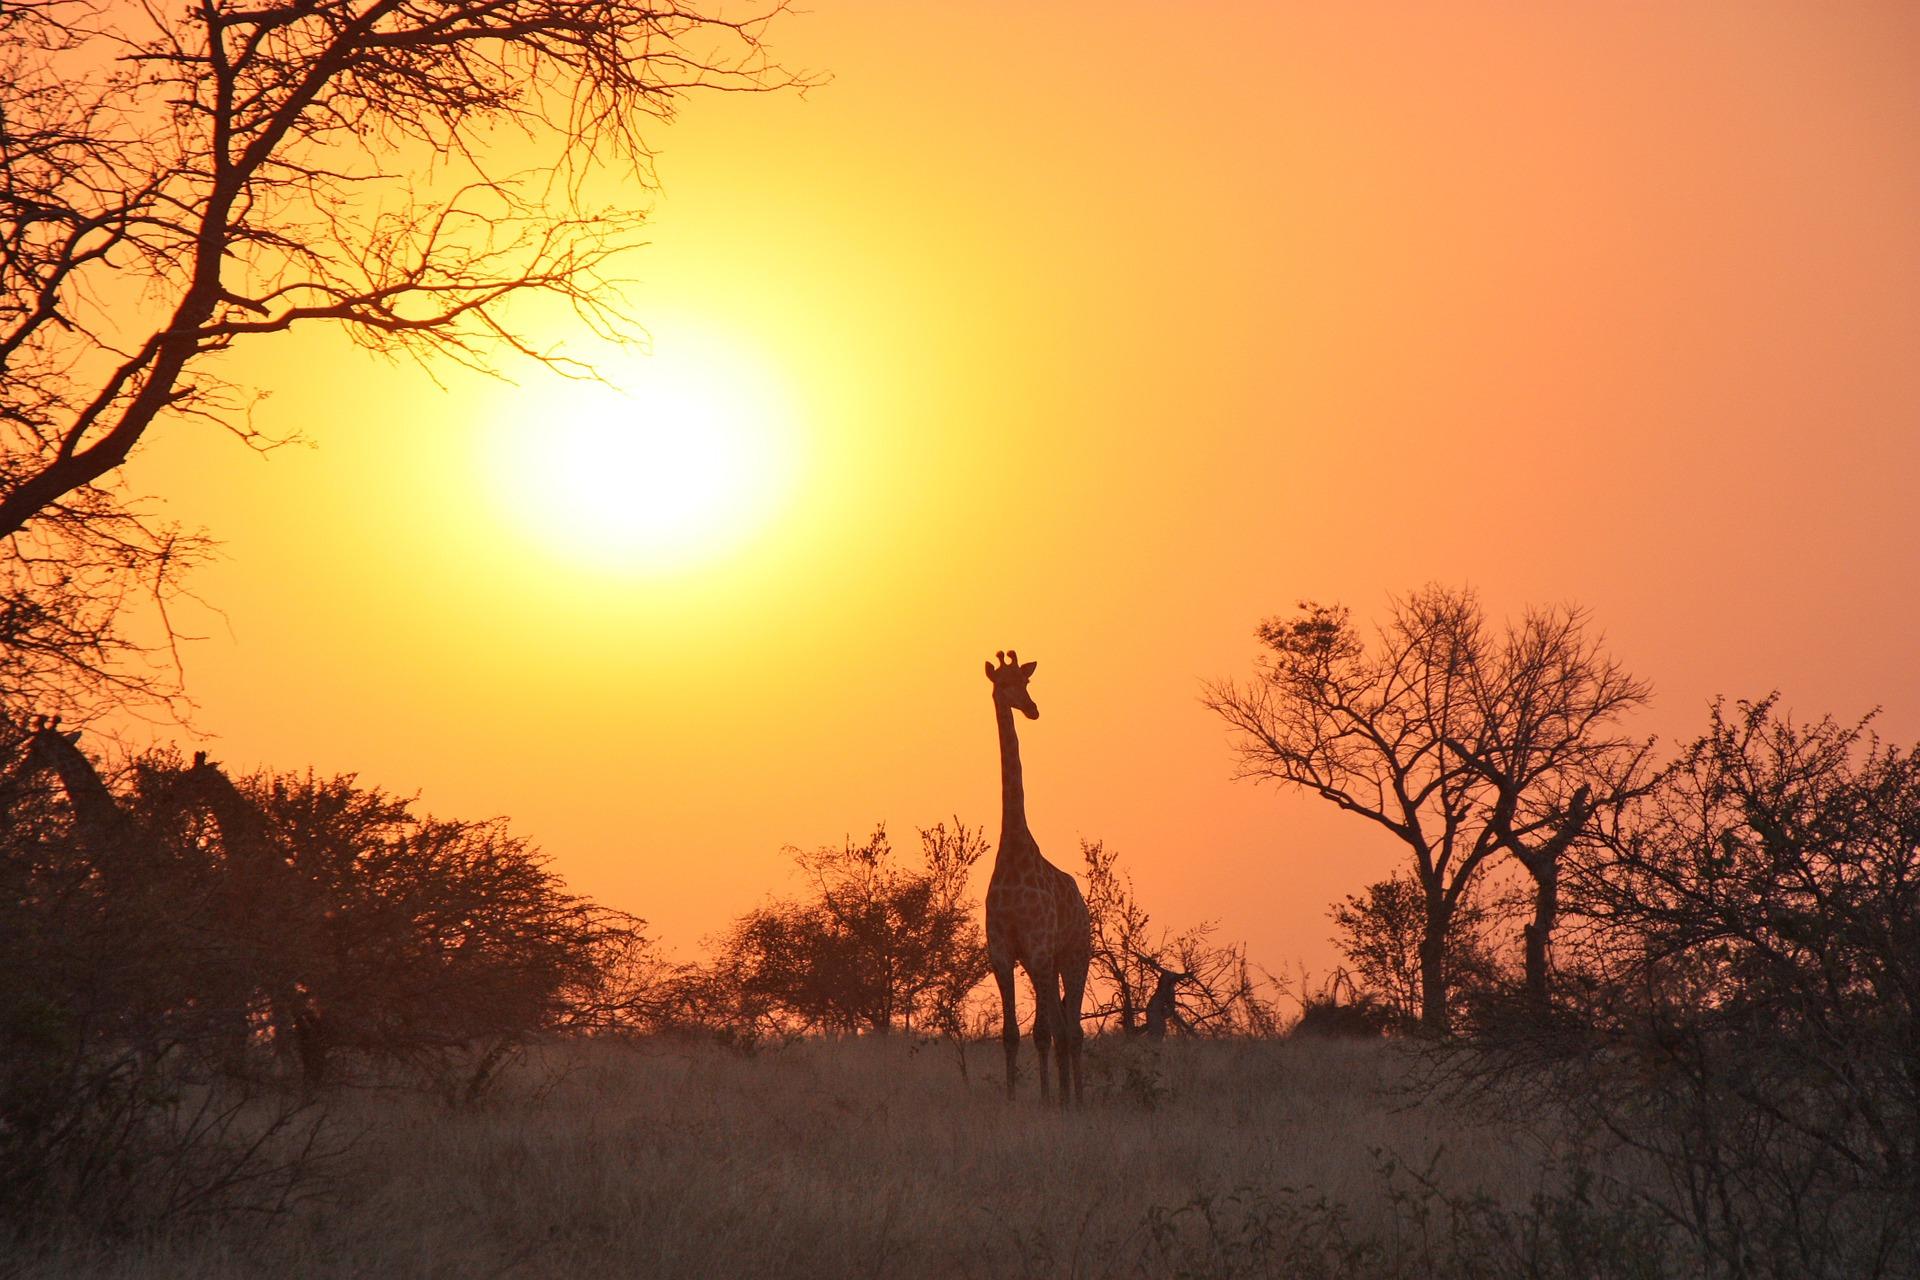 Zambia's Luangwa National Park